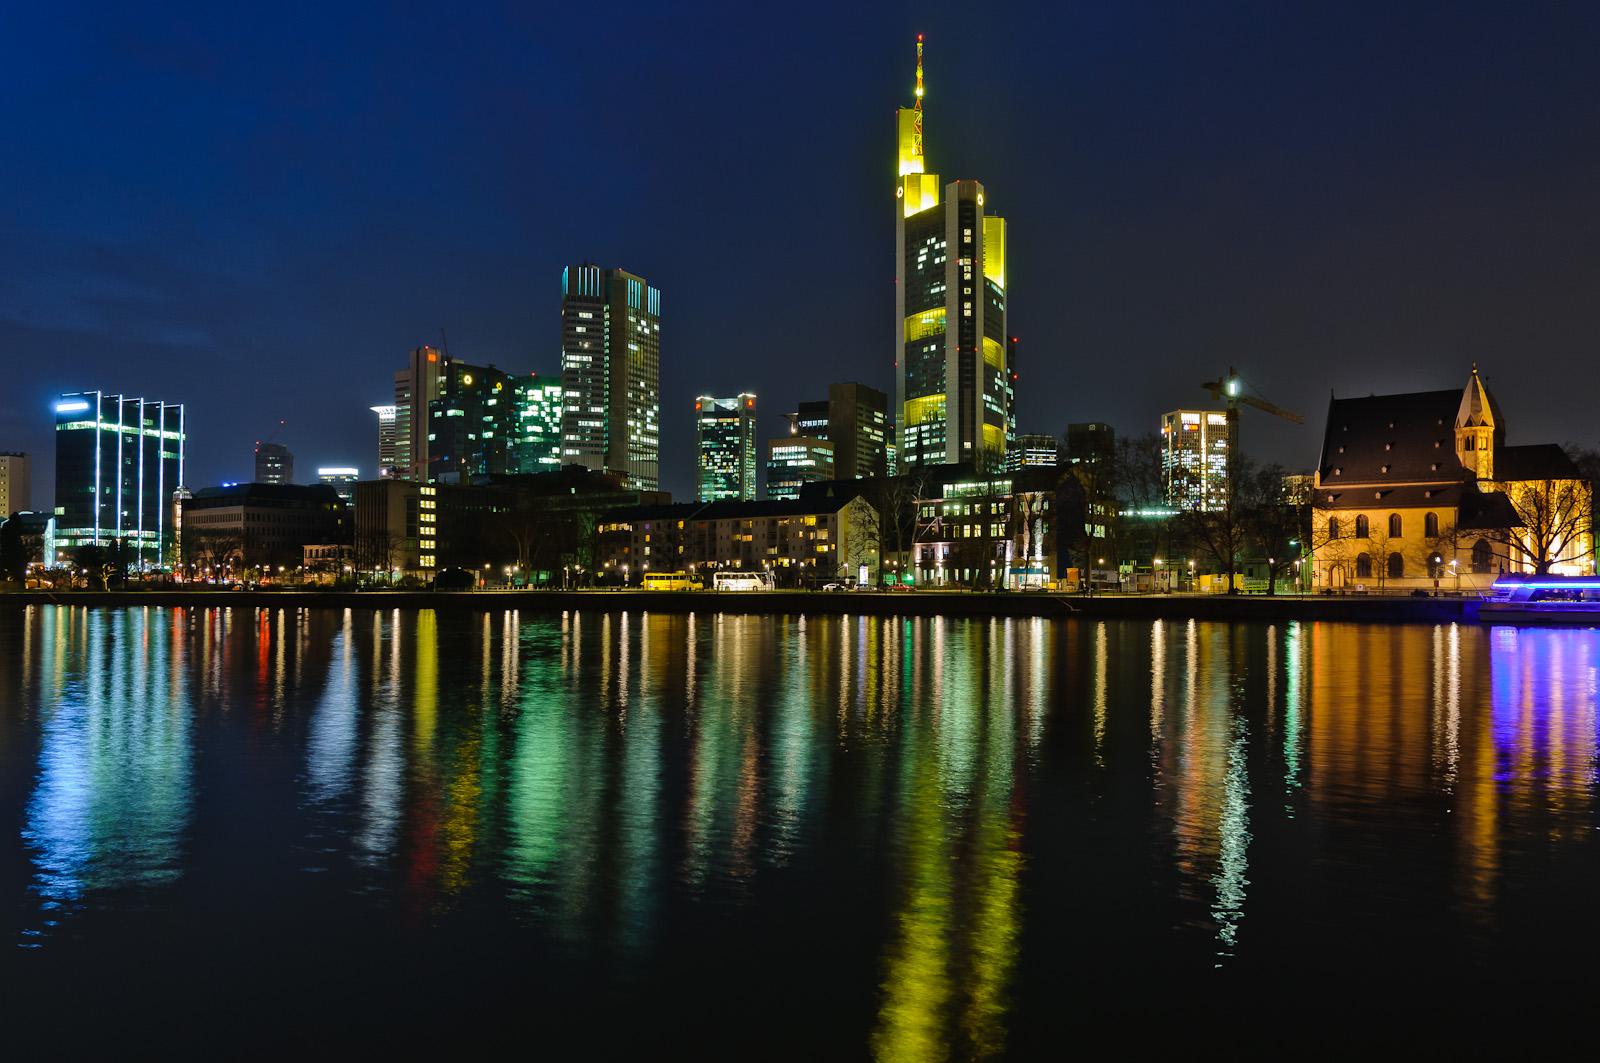 Frankfurt abends am Main (2)